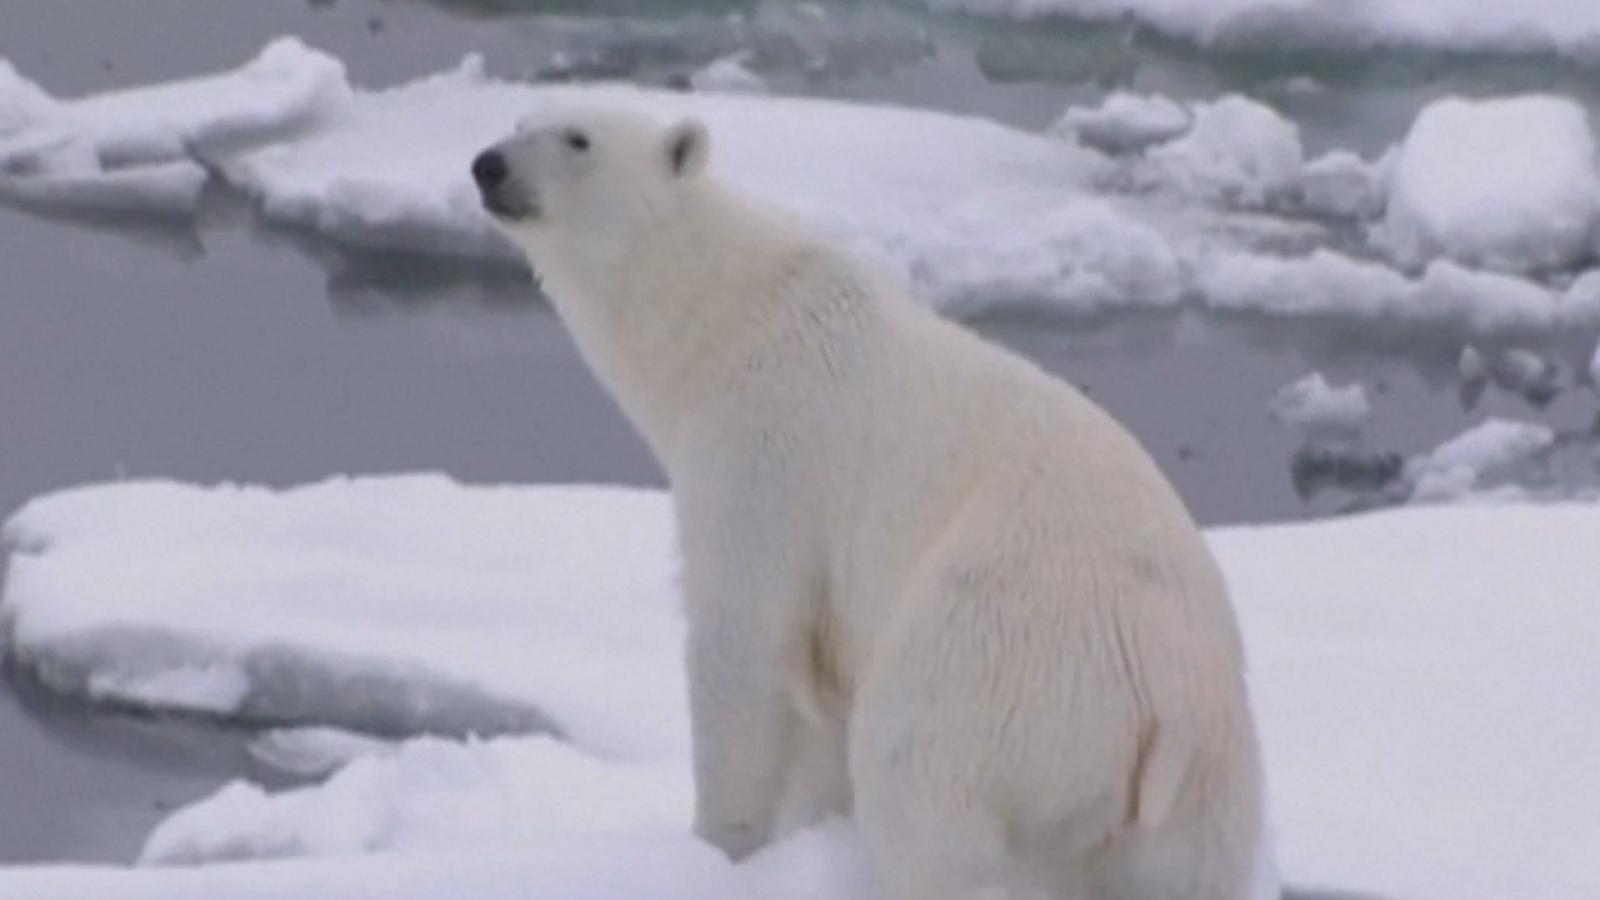 donald-trump-pulls-u-s-out-of-paris-climate-agreement